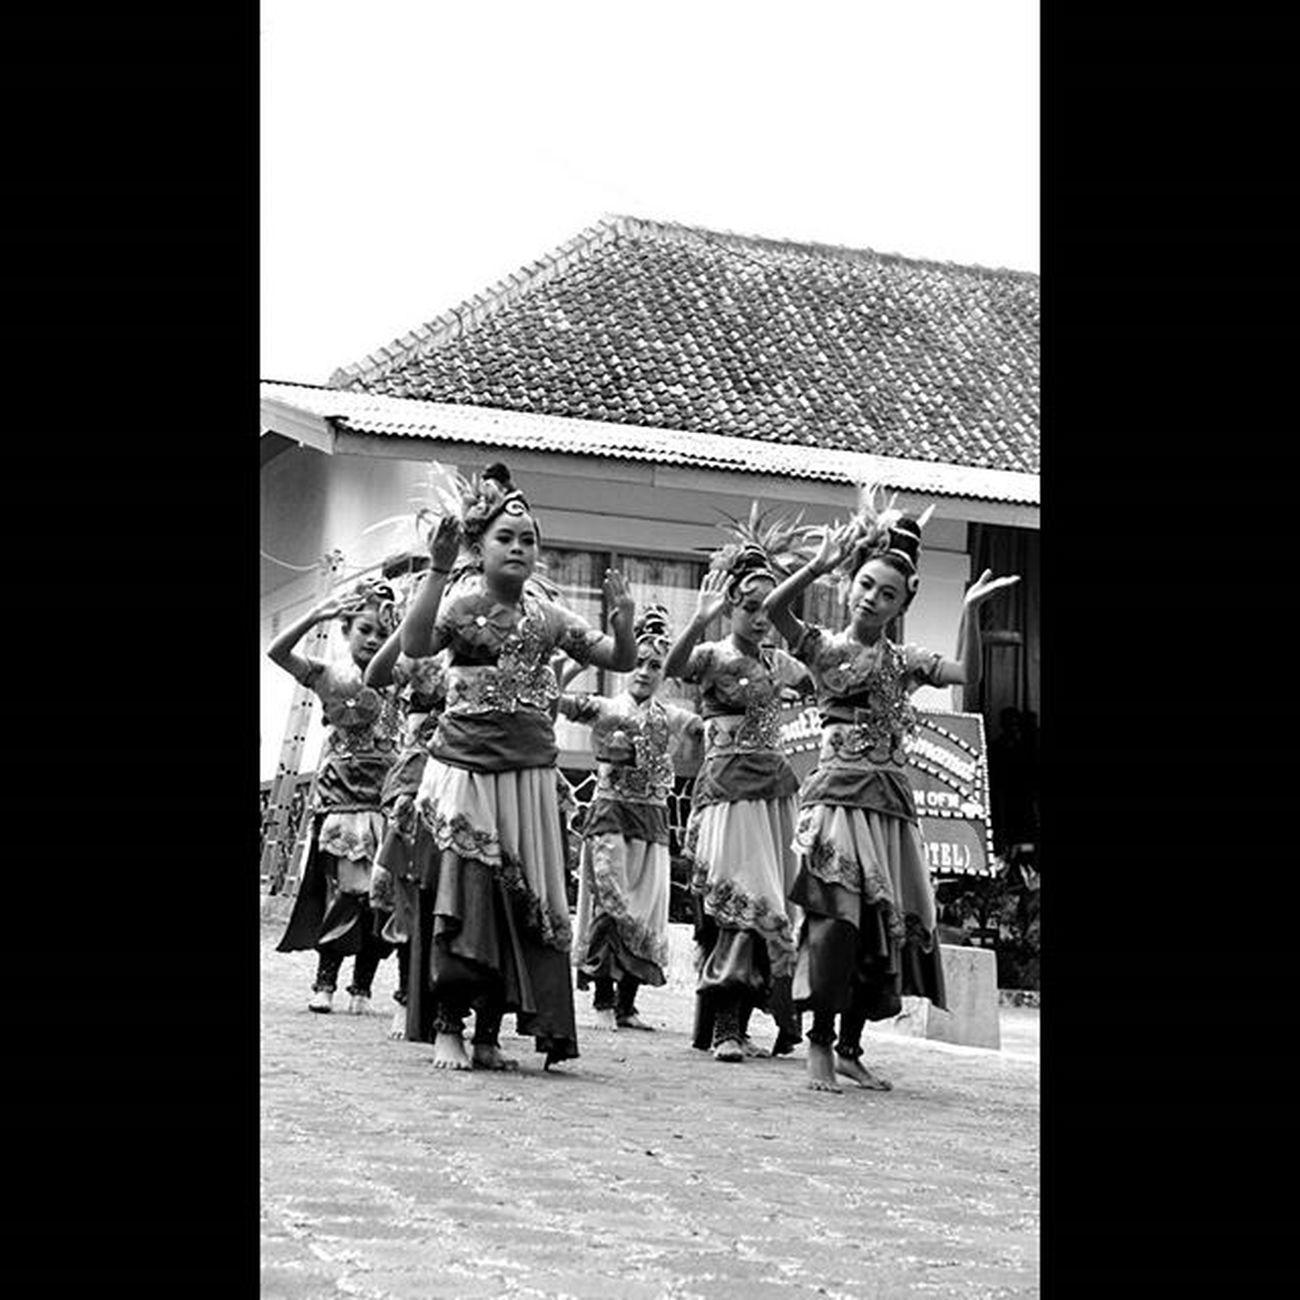 PestaEmasImamat PaterMartinHarunOFM Blackandwhitephotography Instasize